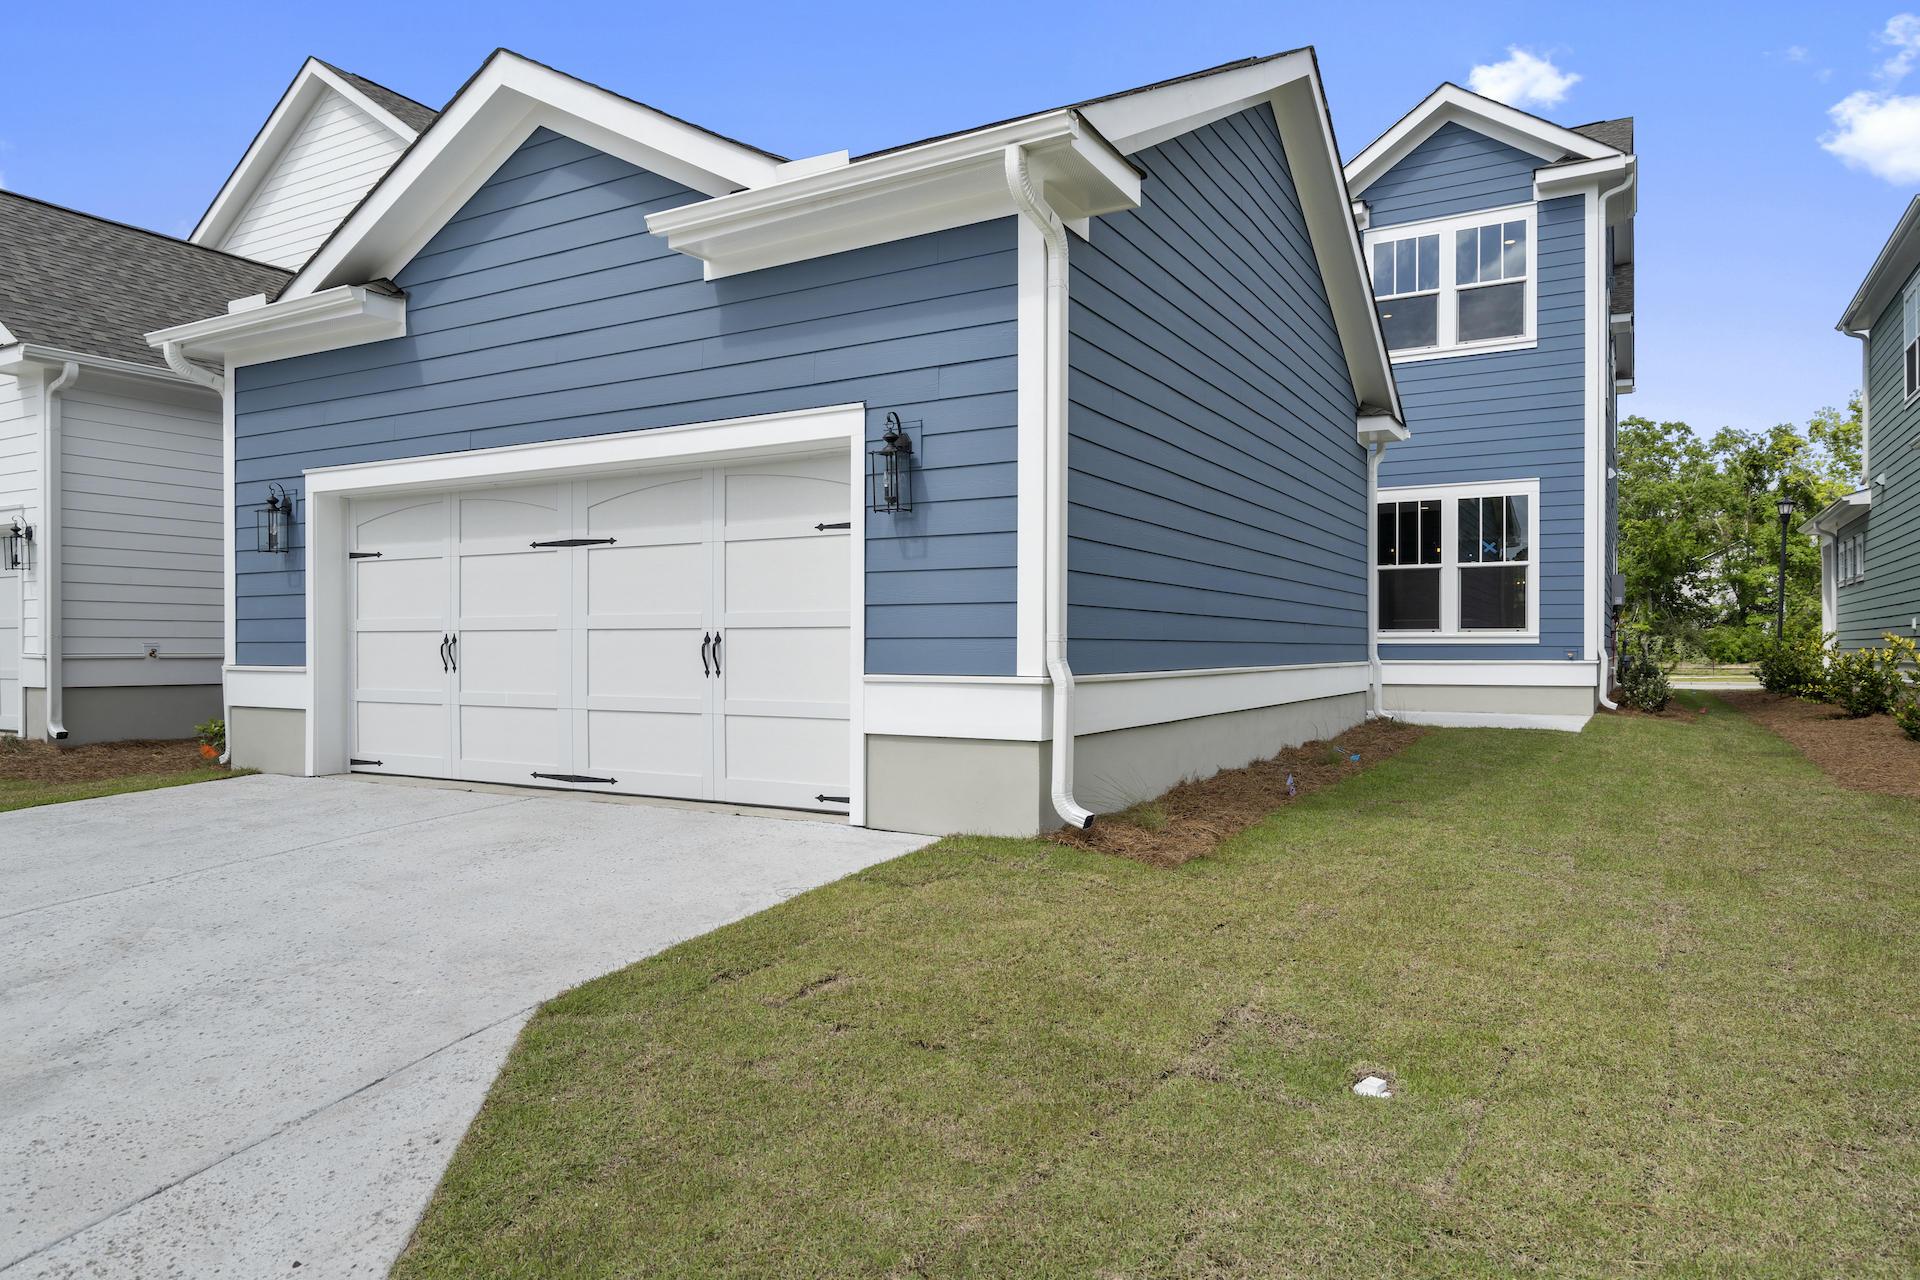 Midtown Homes For Sale - 1344 Upper Union, Mount Pleasant, SC - 45